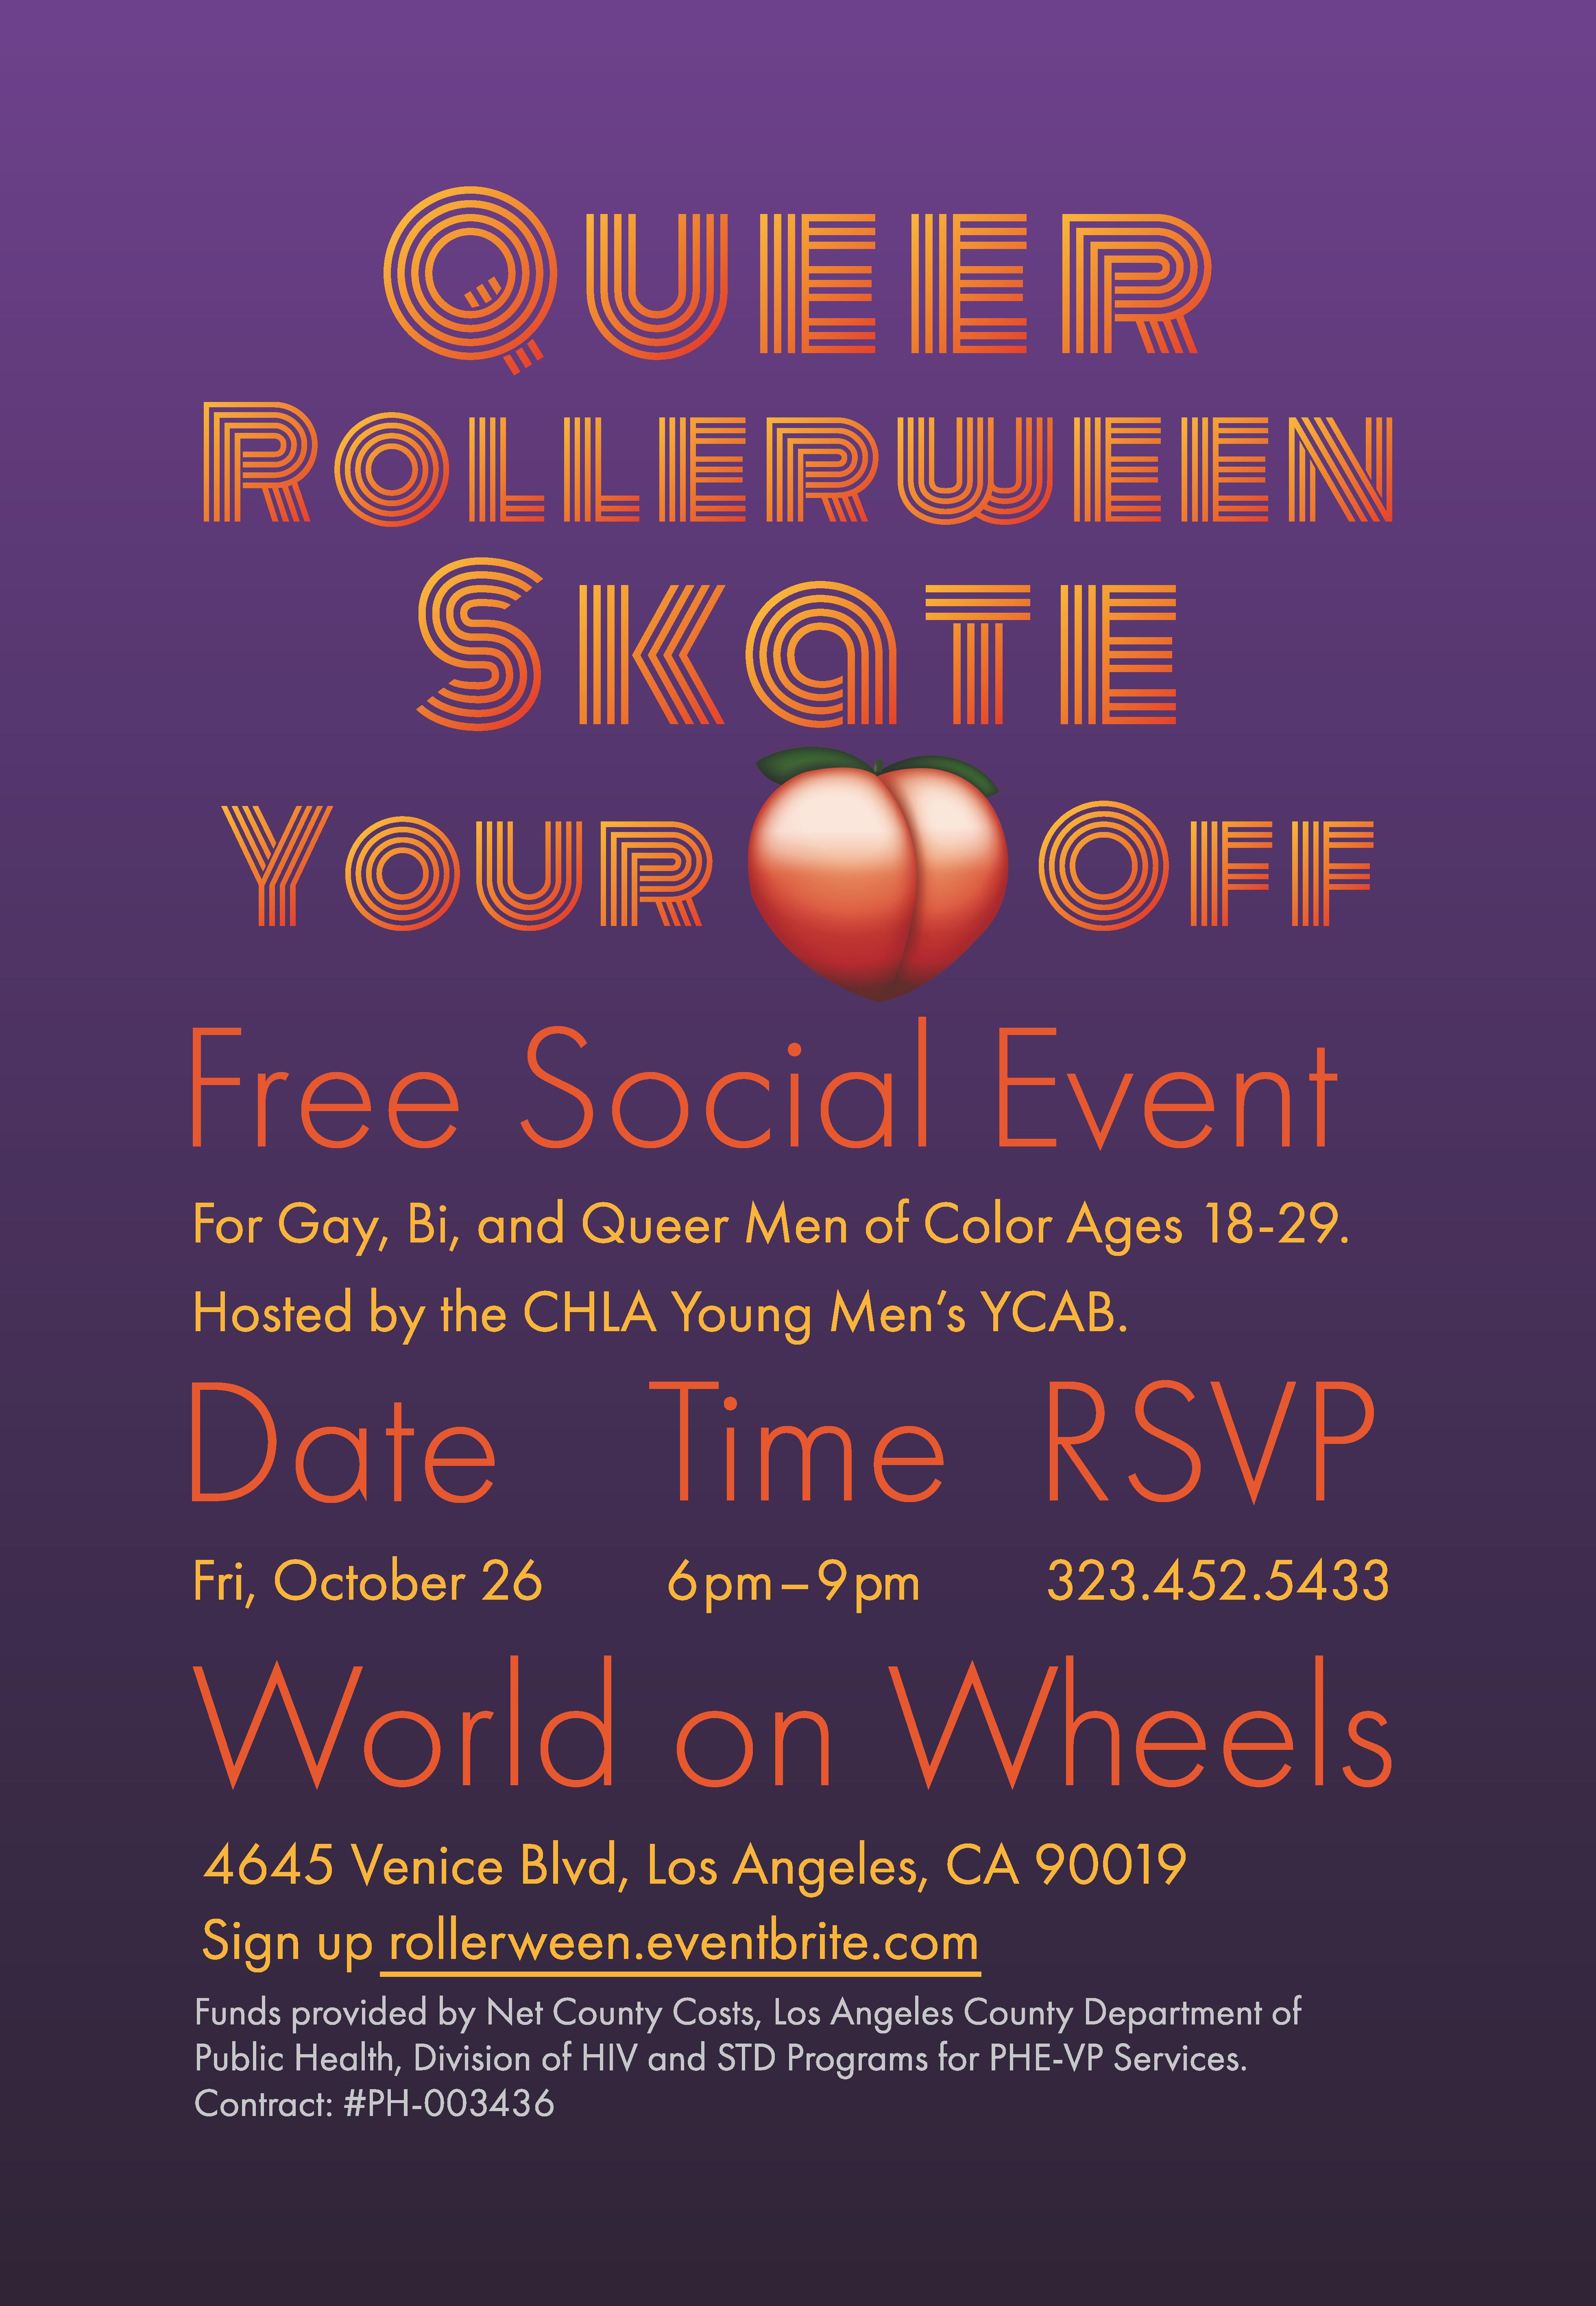 rollerween-print-flyer.png